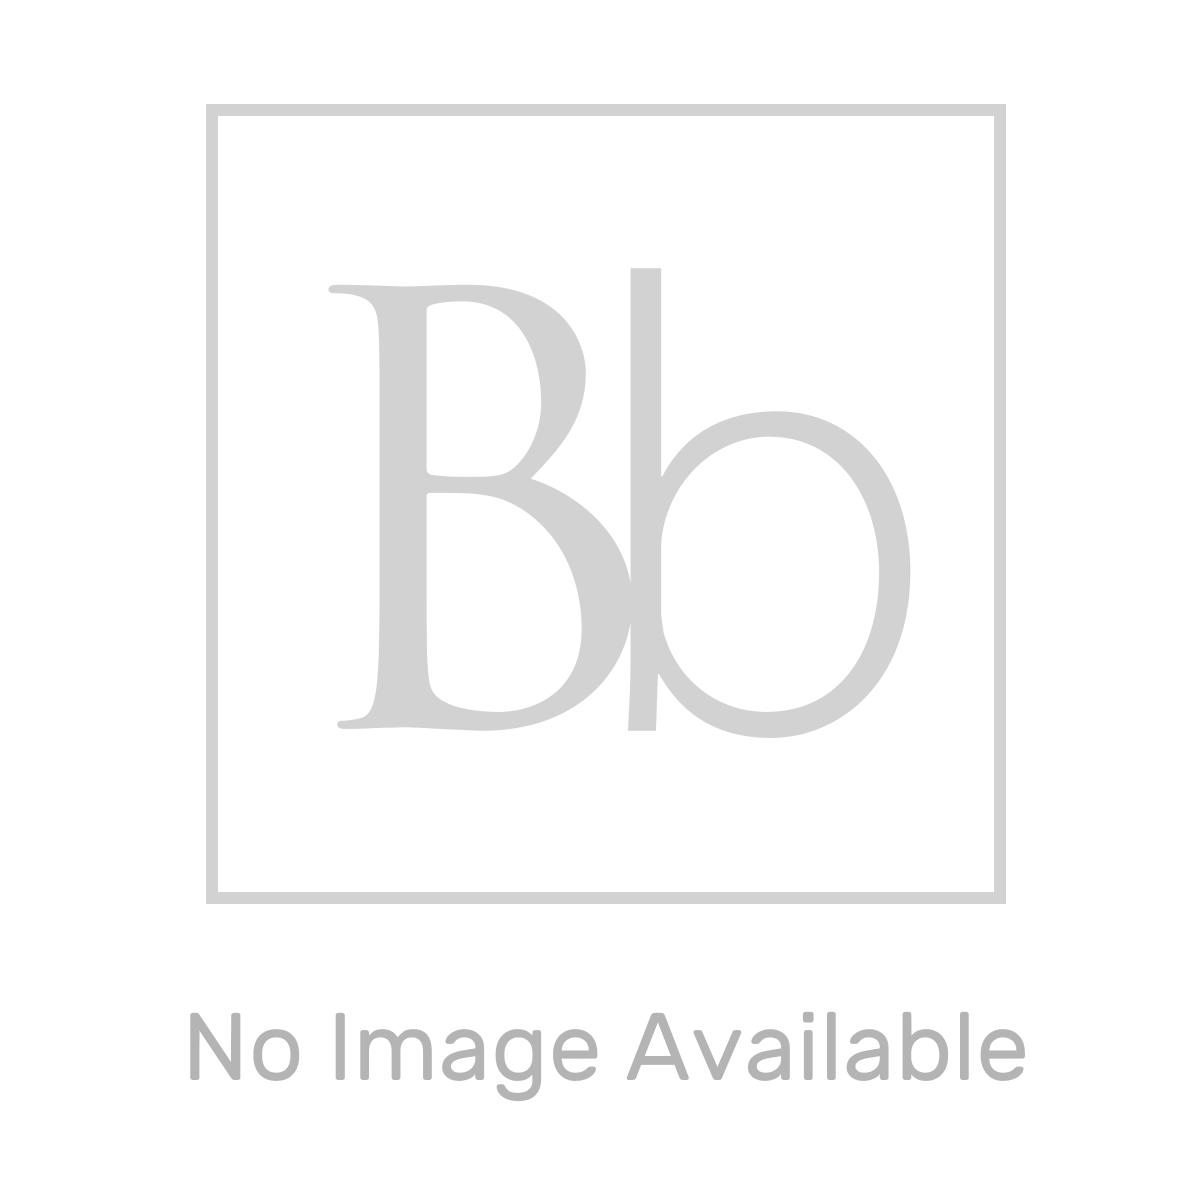 RAK Series 600 Toilet and 400 Series Medium Oak Vanity Unit Basin